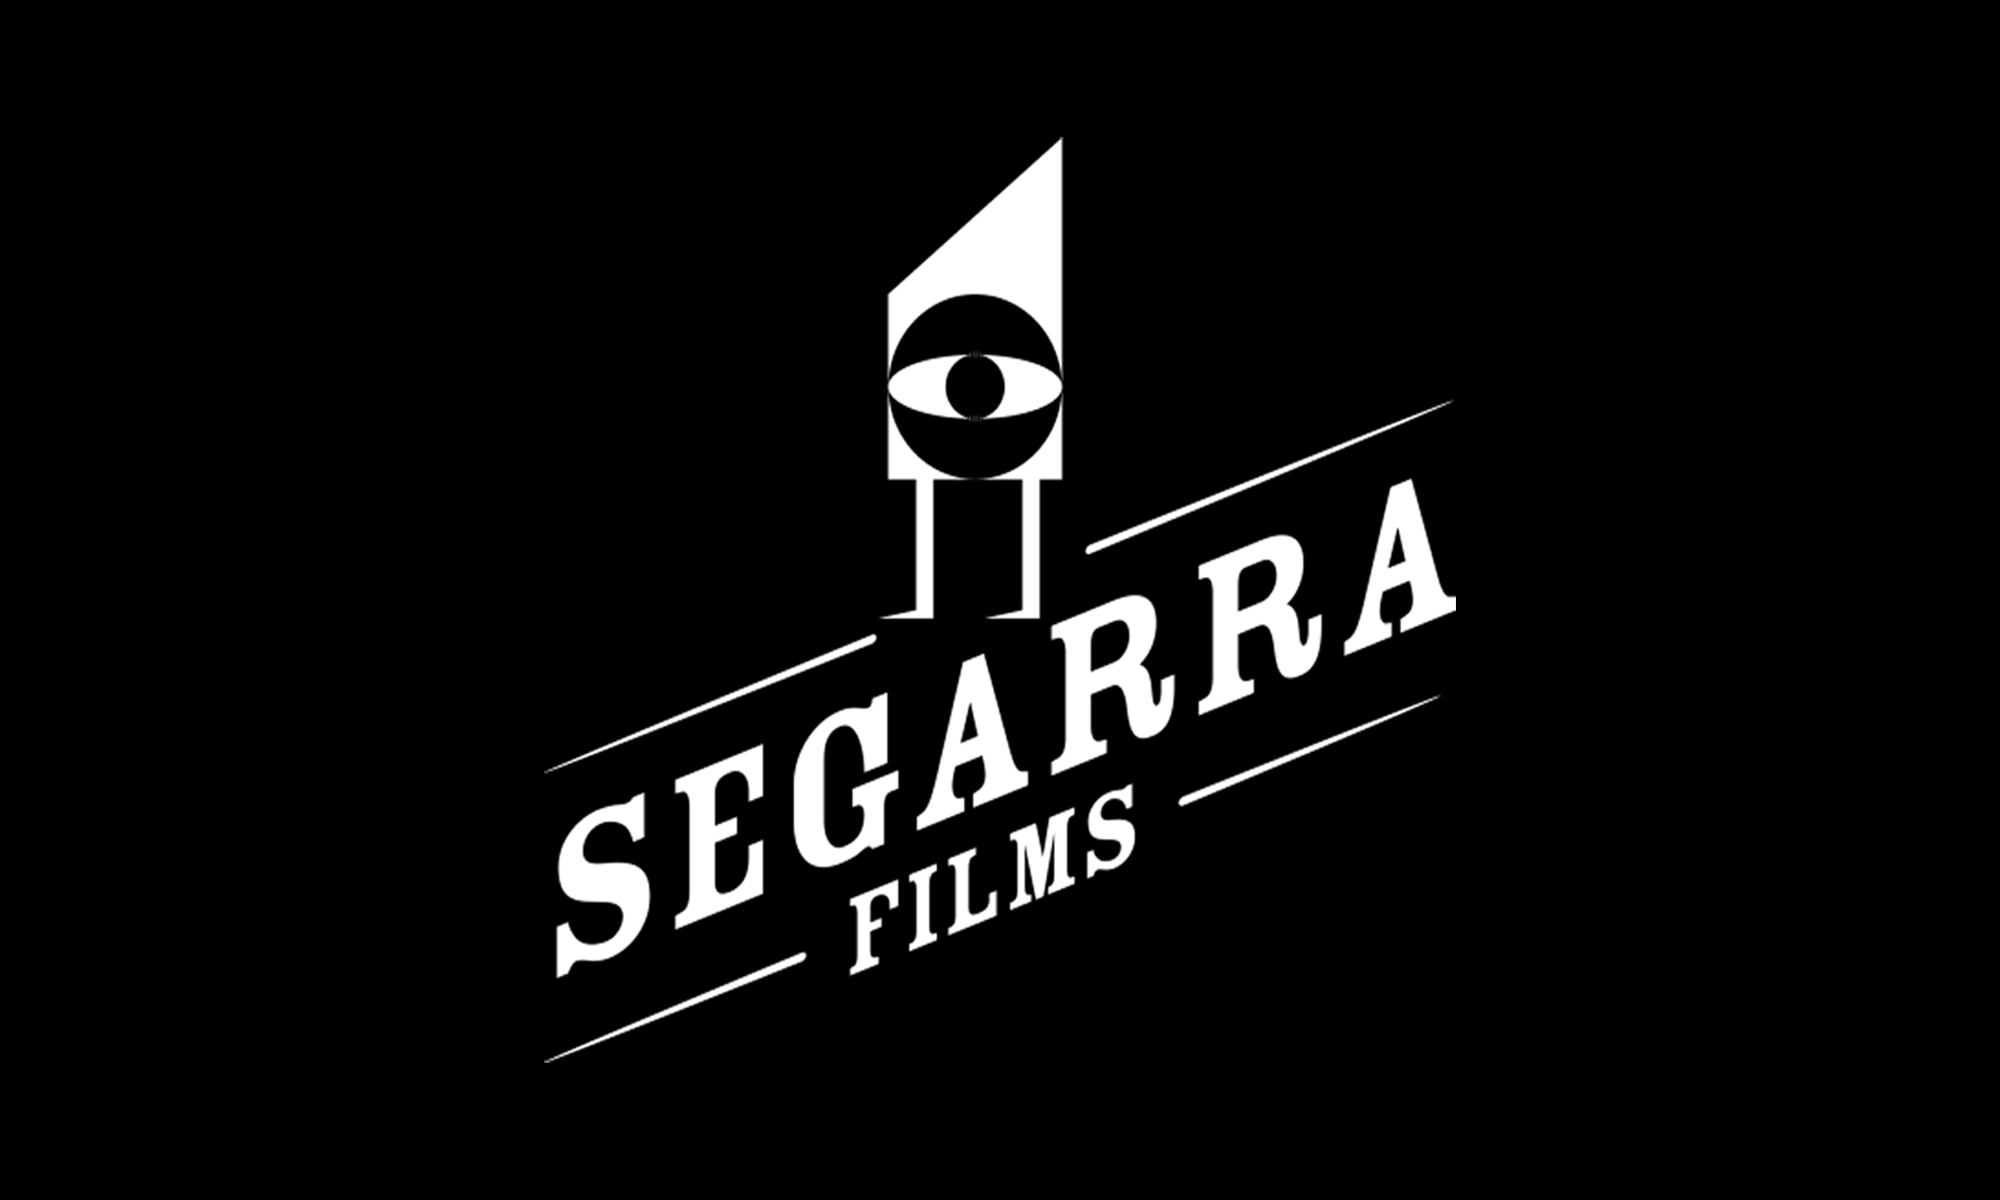 Segarra Films